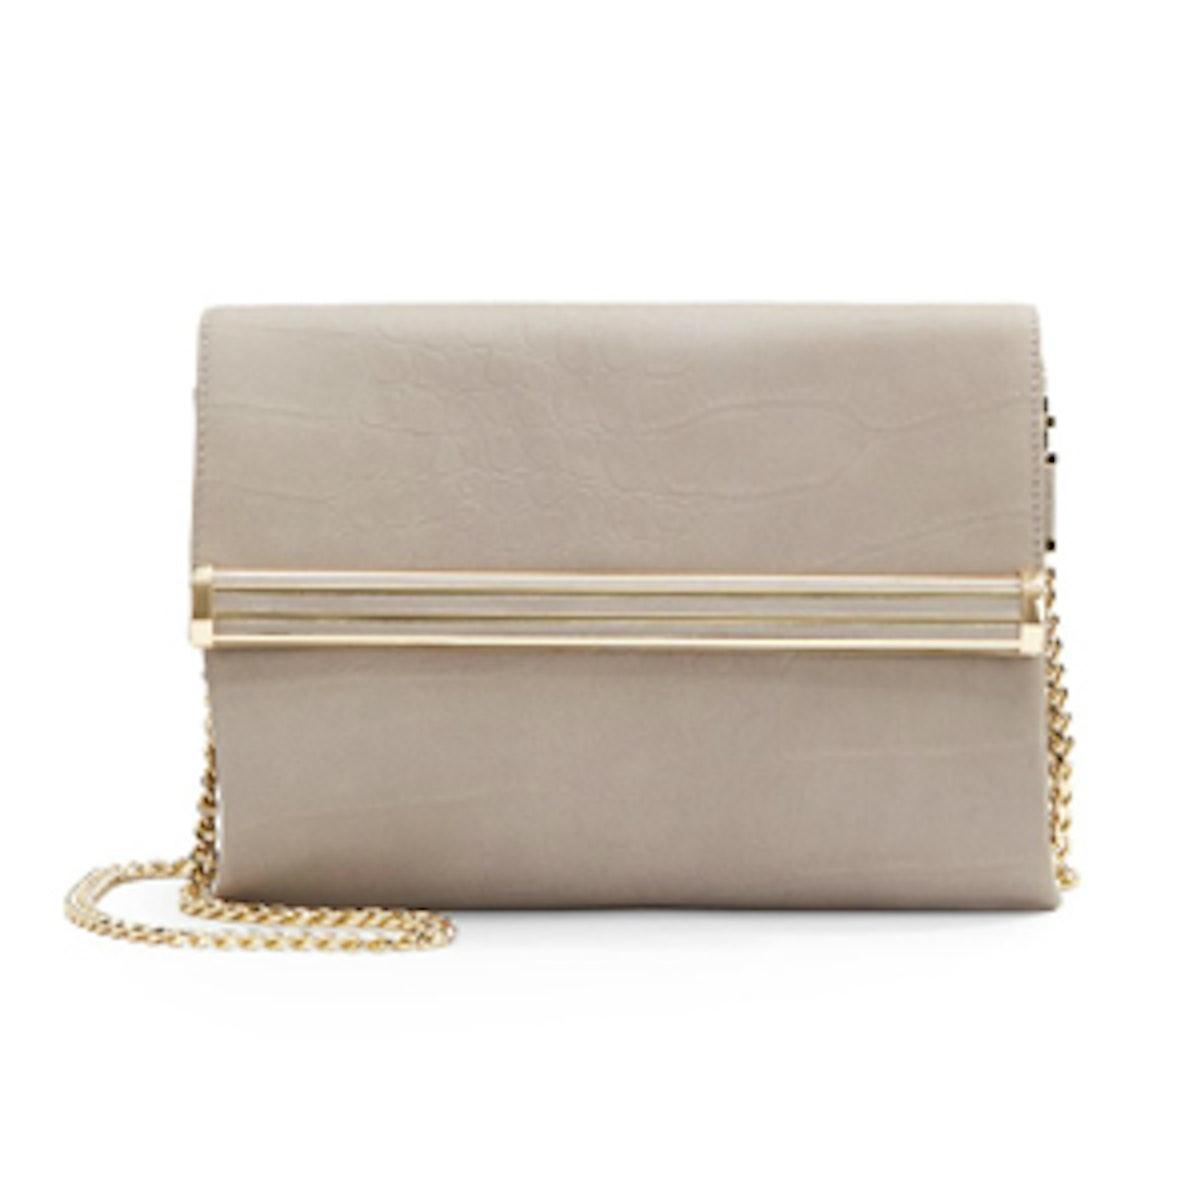 Embossed Flap Bag